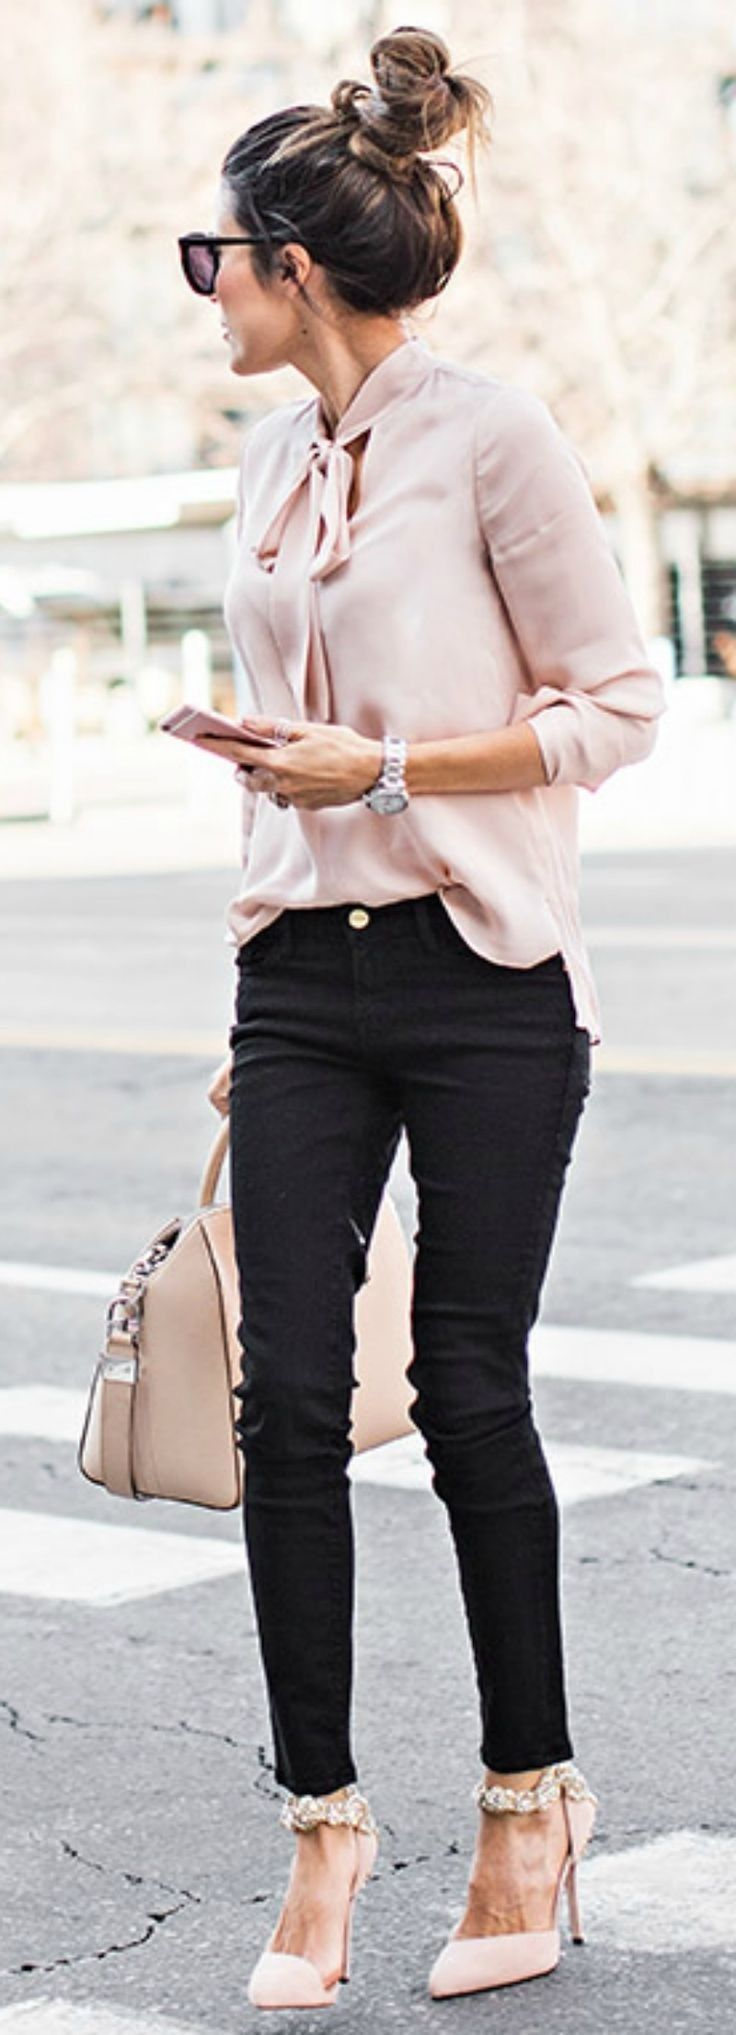 #spring tight black #pants